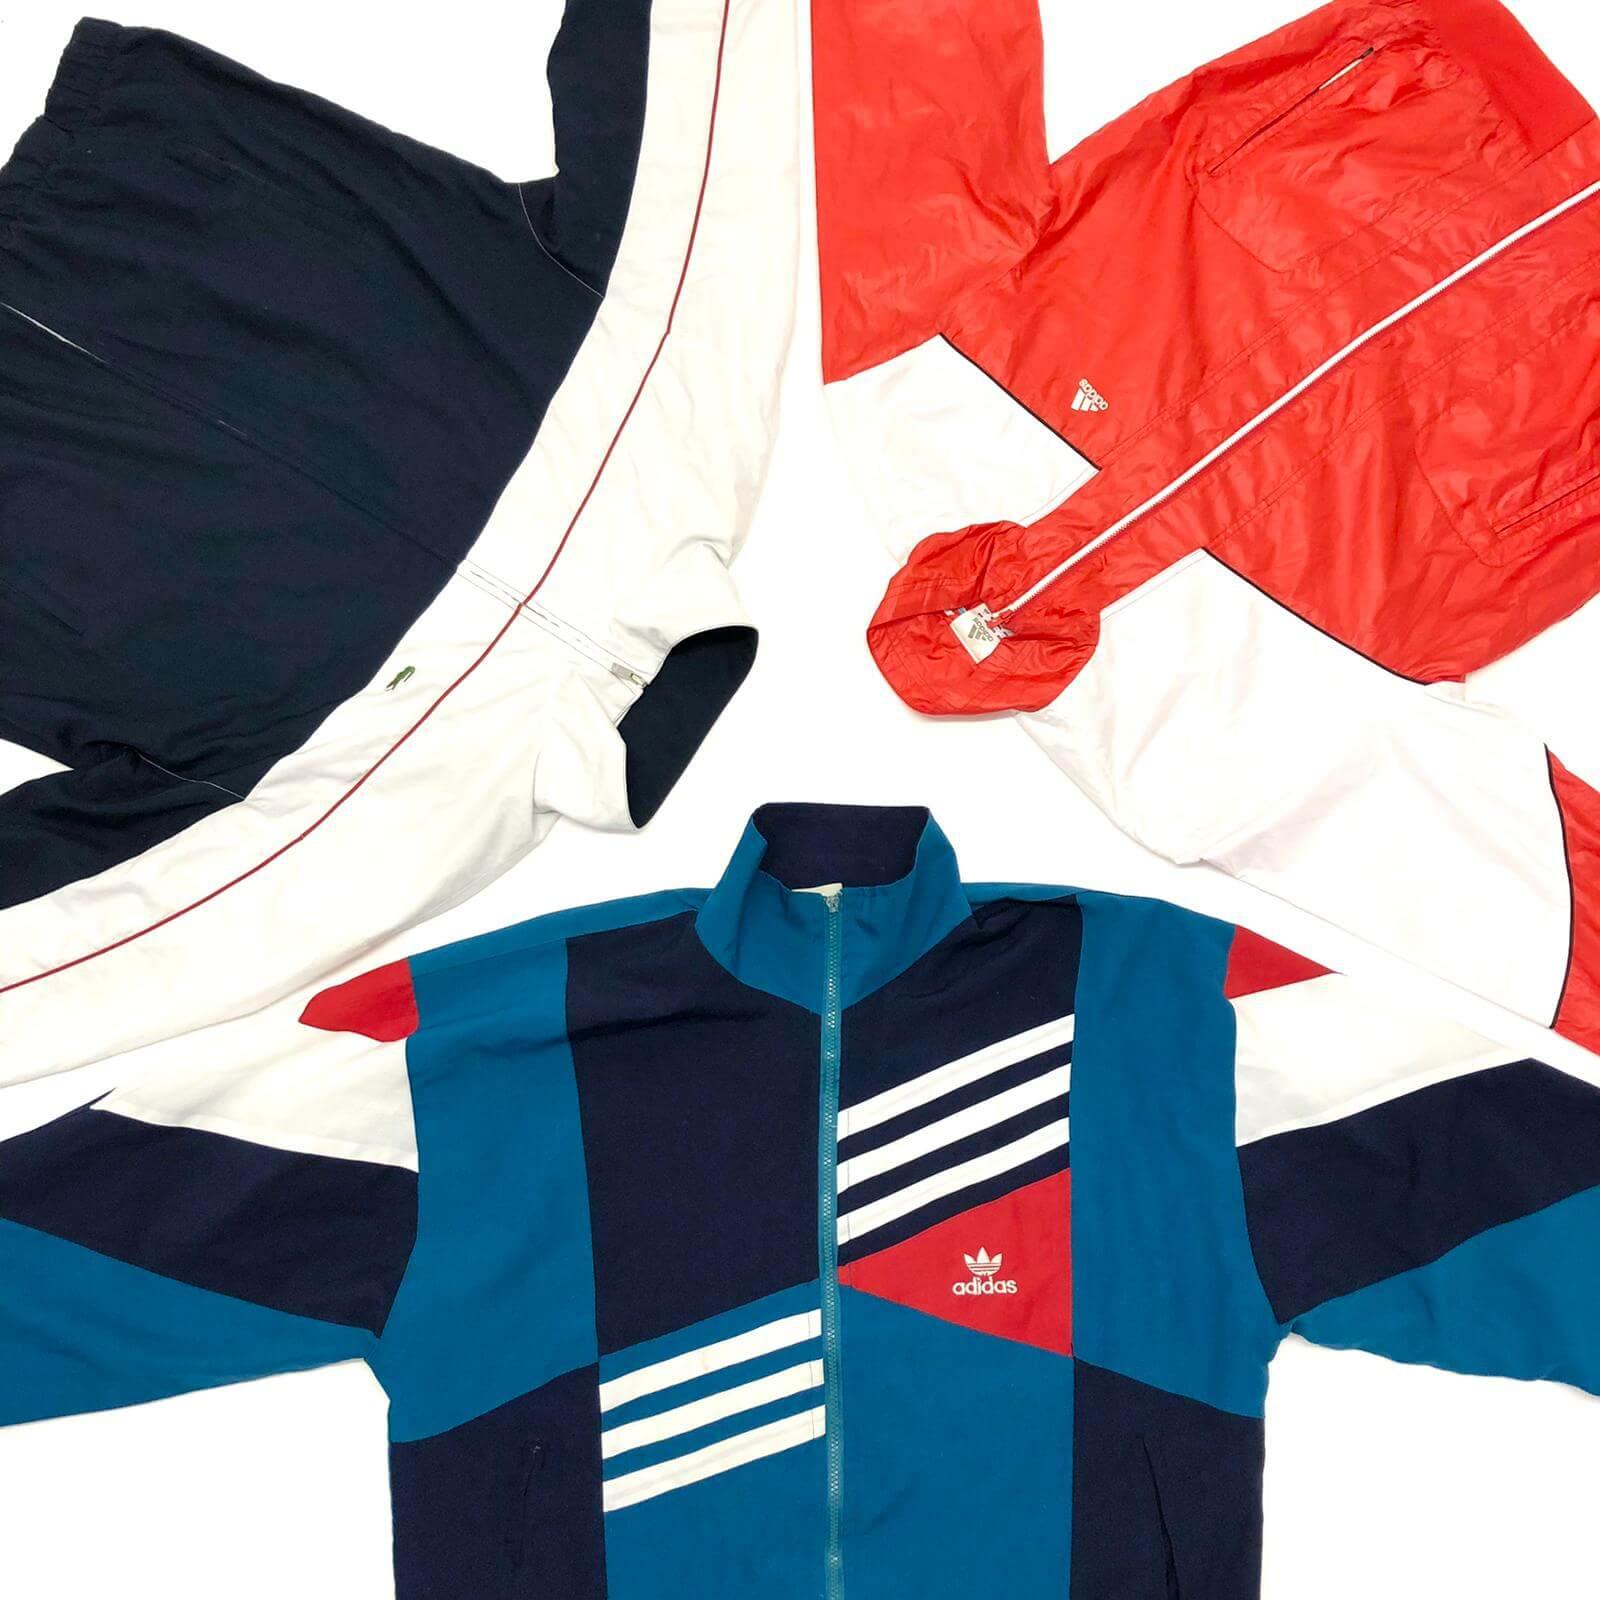 Vintage 90's Adidas Puma Nike Track/Shell Tops Mix